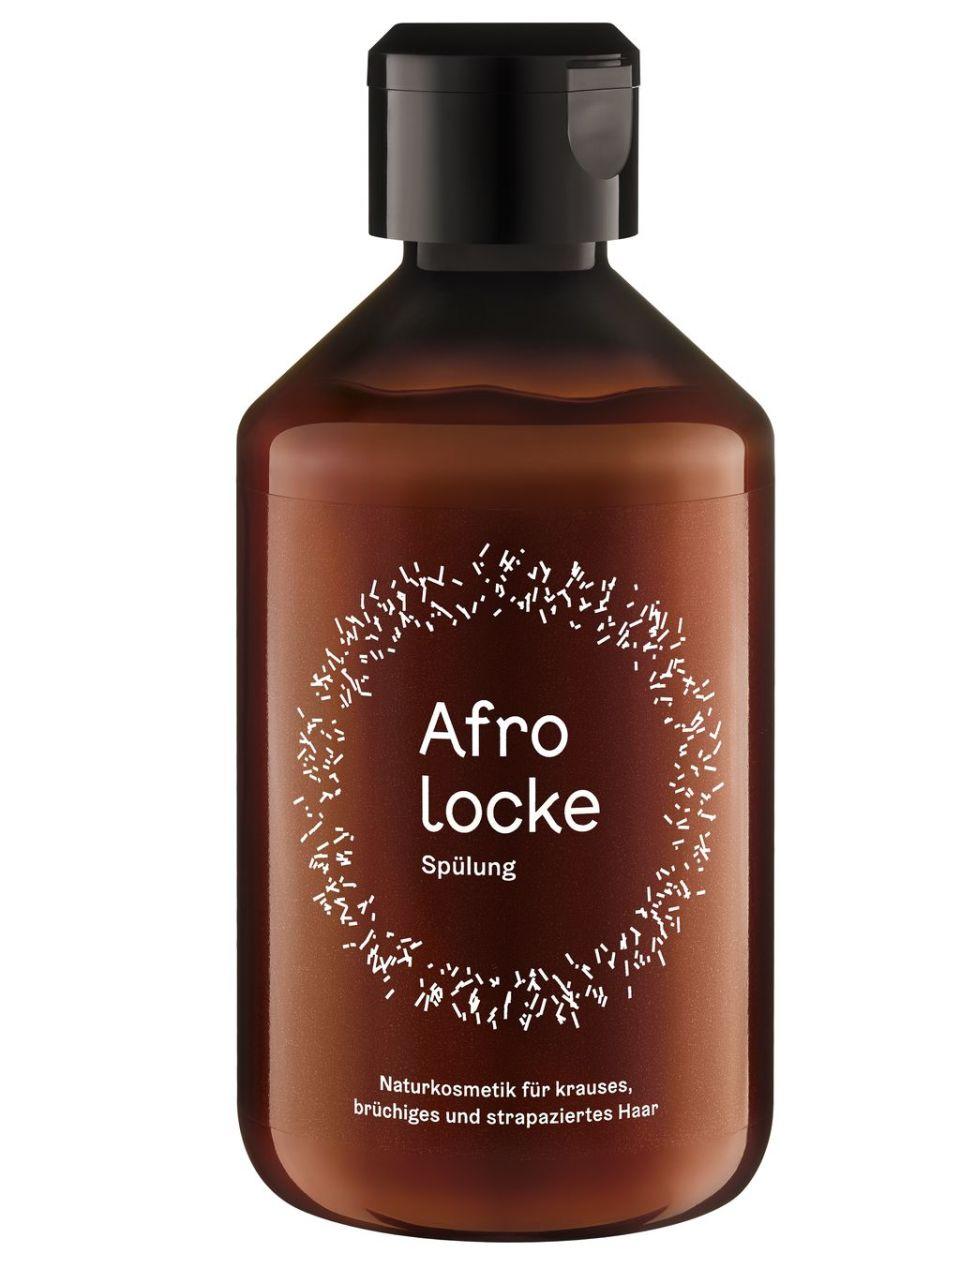 Afrolocke Conditioner / Lockenpflege Spülung